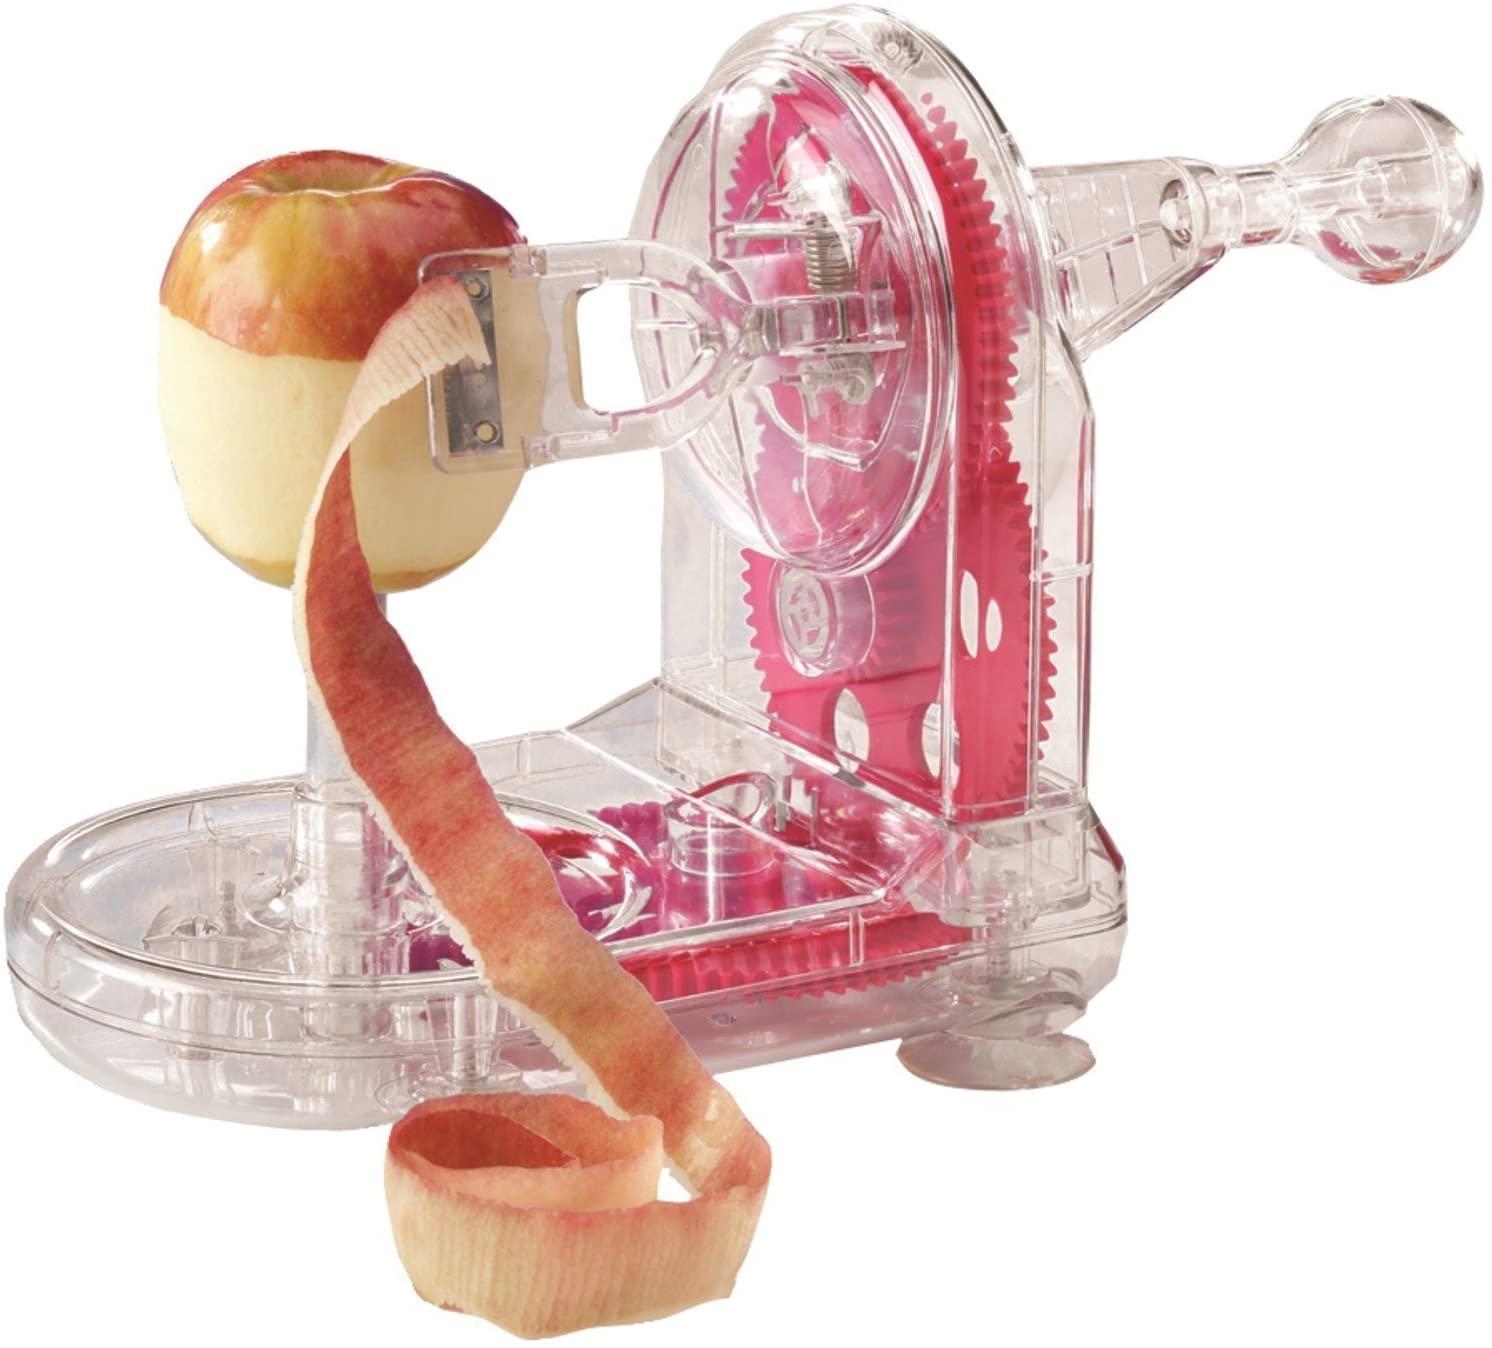 creative gadget vegetable fruits peeler